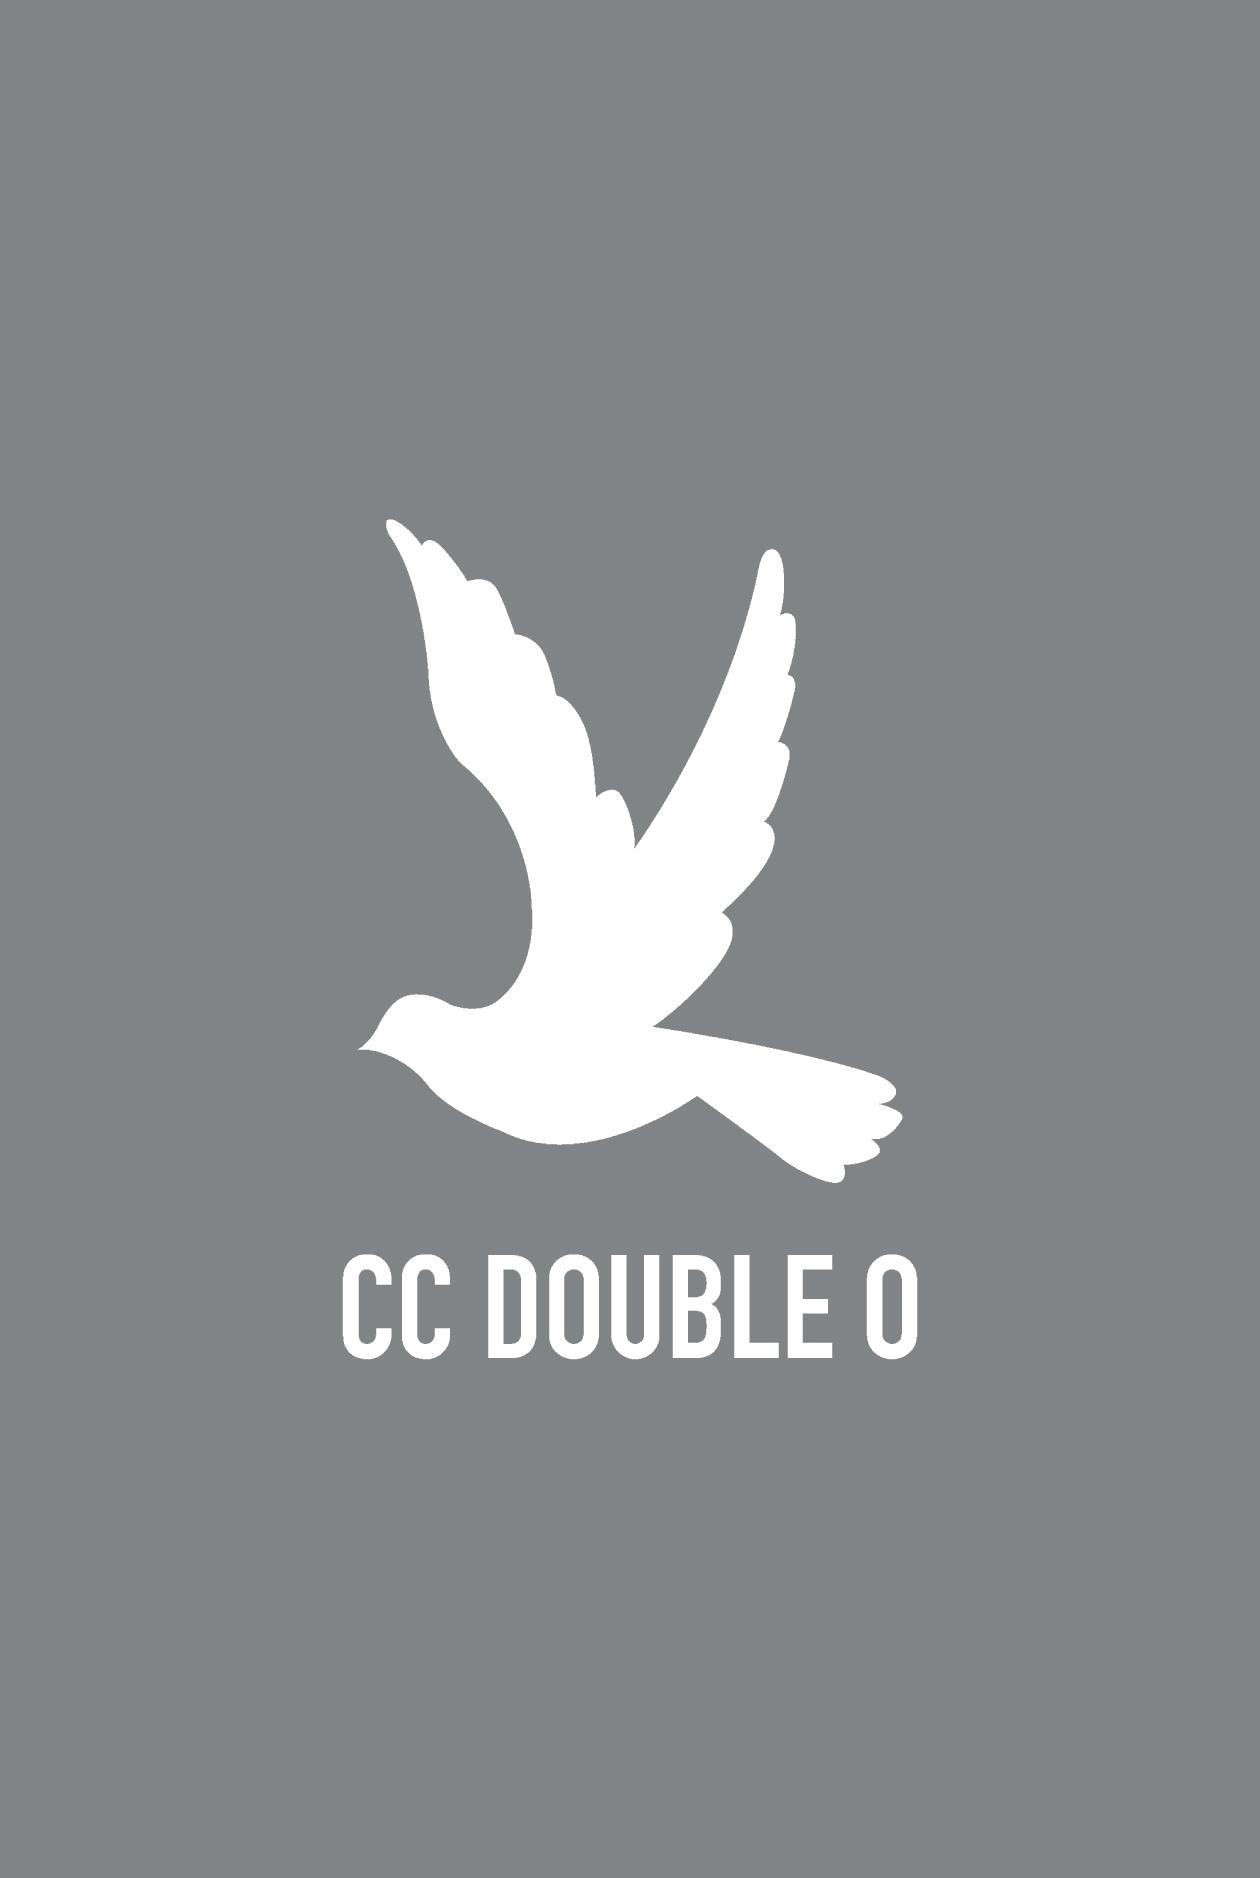 CC DOUBLE O Windbreaker in Camouflage